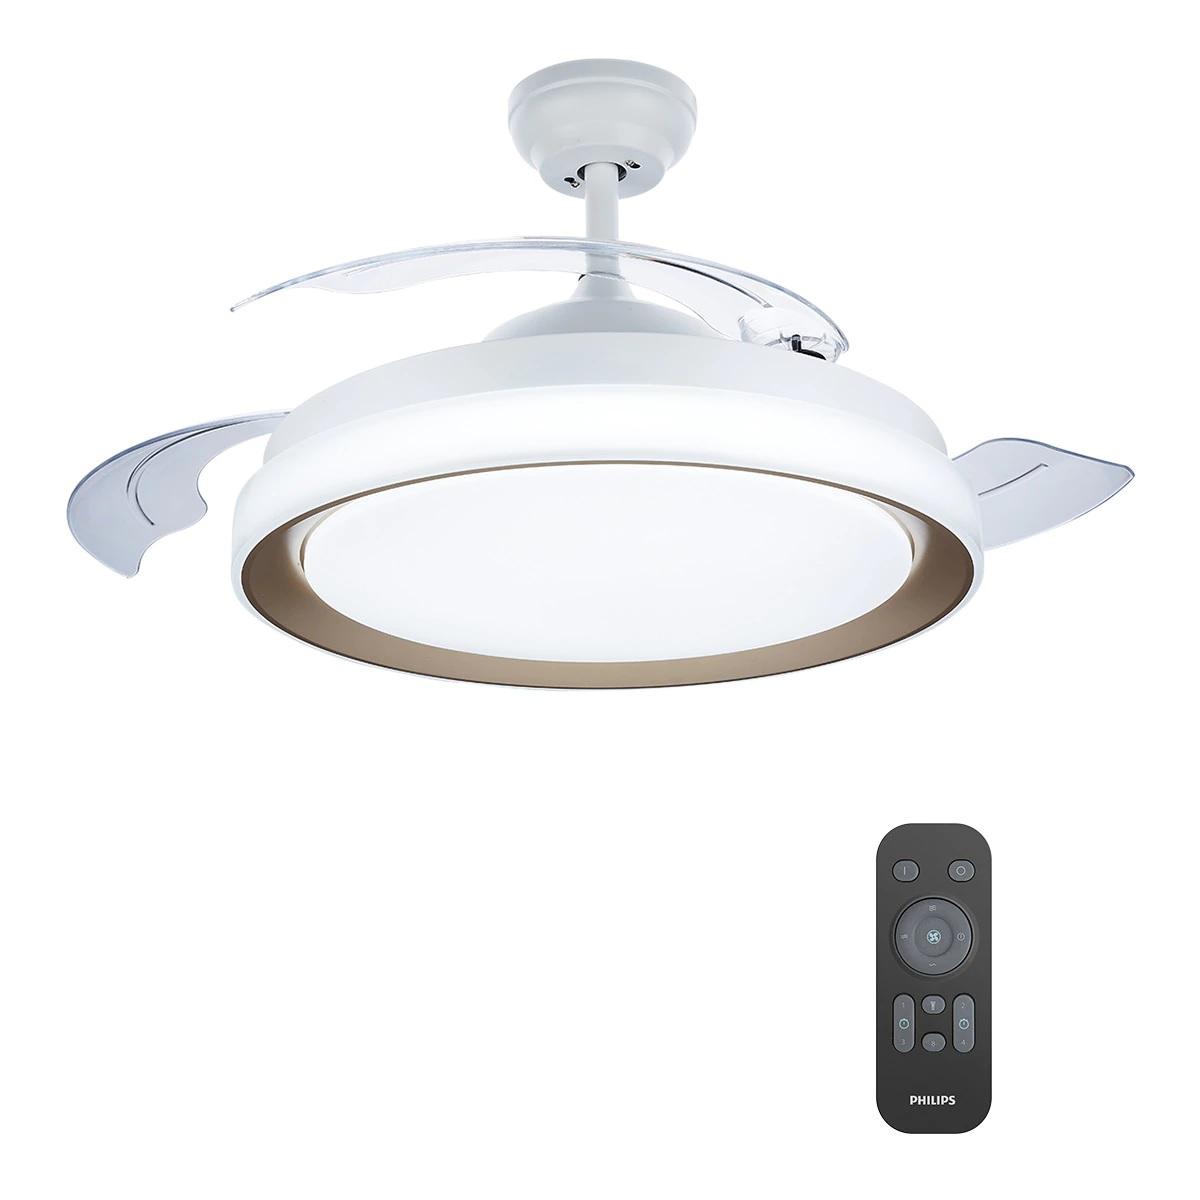 Ventilador de techo retráctil con luz LED integrada Bliss Philips